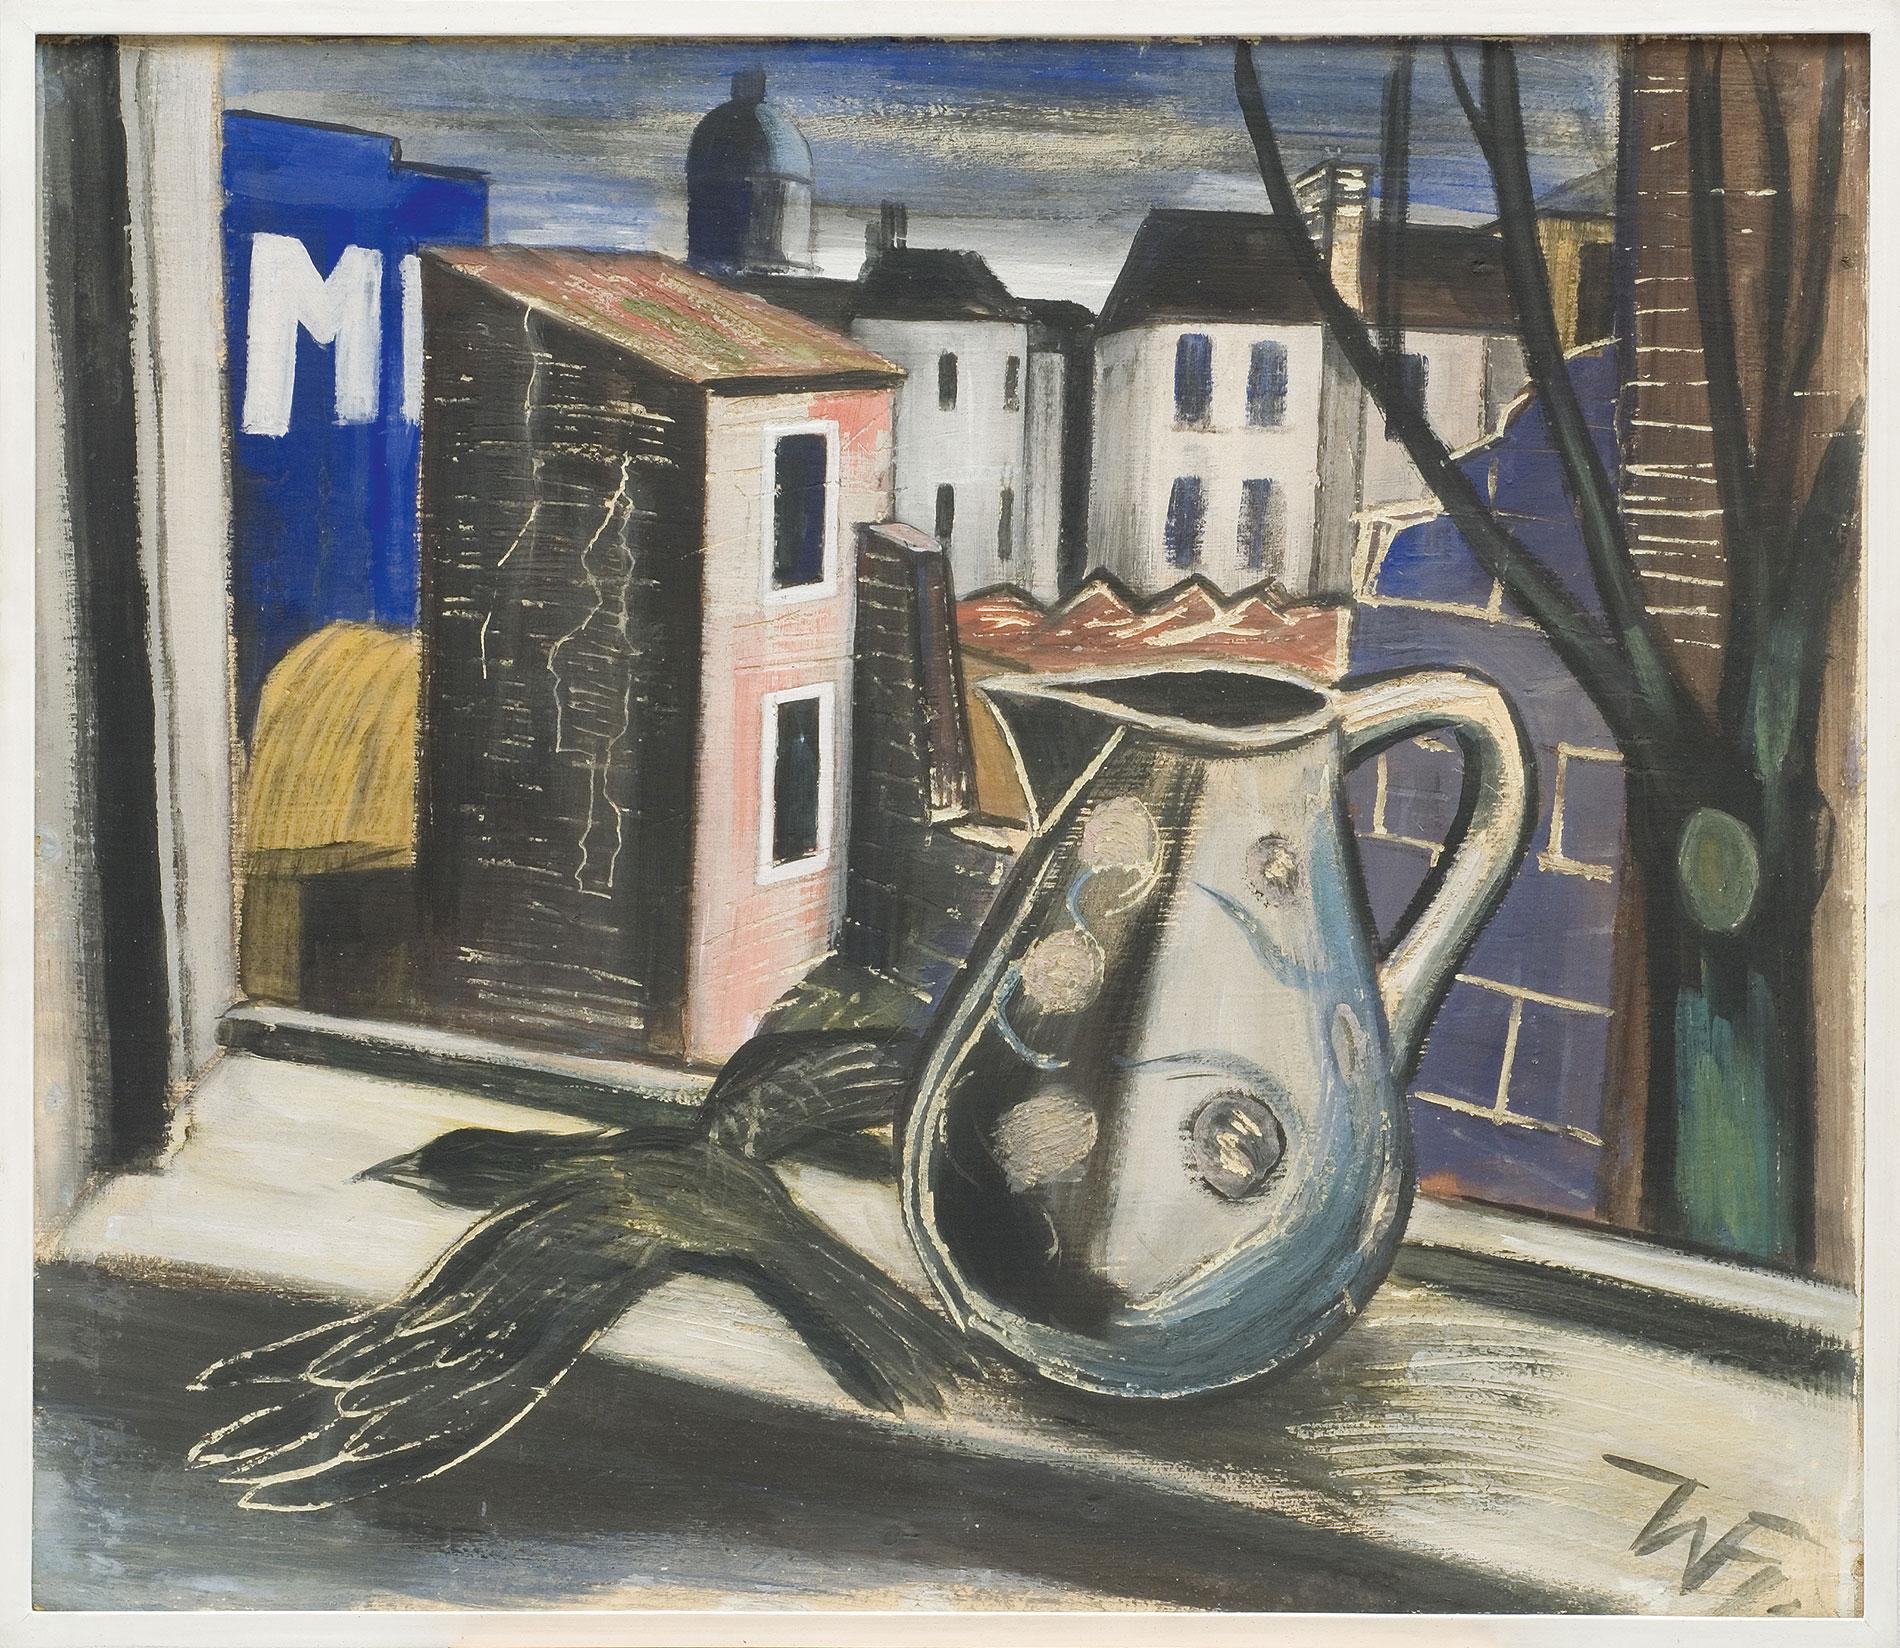 Werner Heldt, Fensterausblick mit totem Vogel, 1945, 85 × 99 cm; Sprengel Museum Hannover